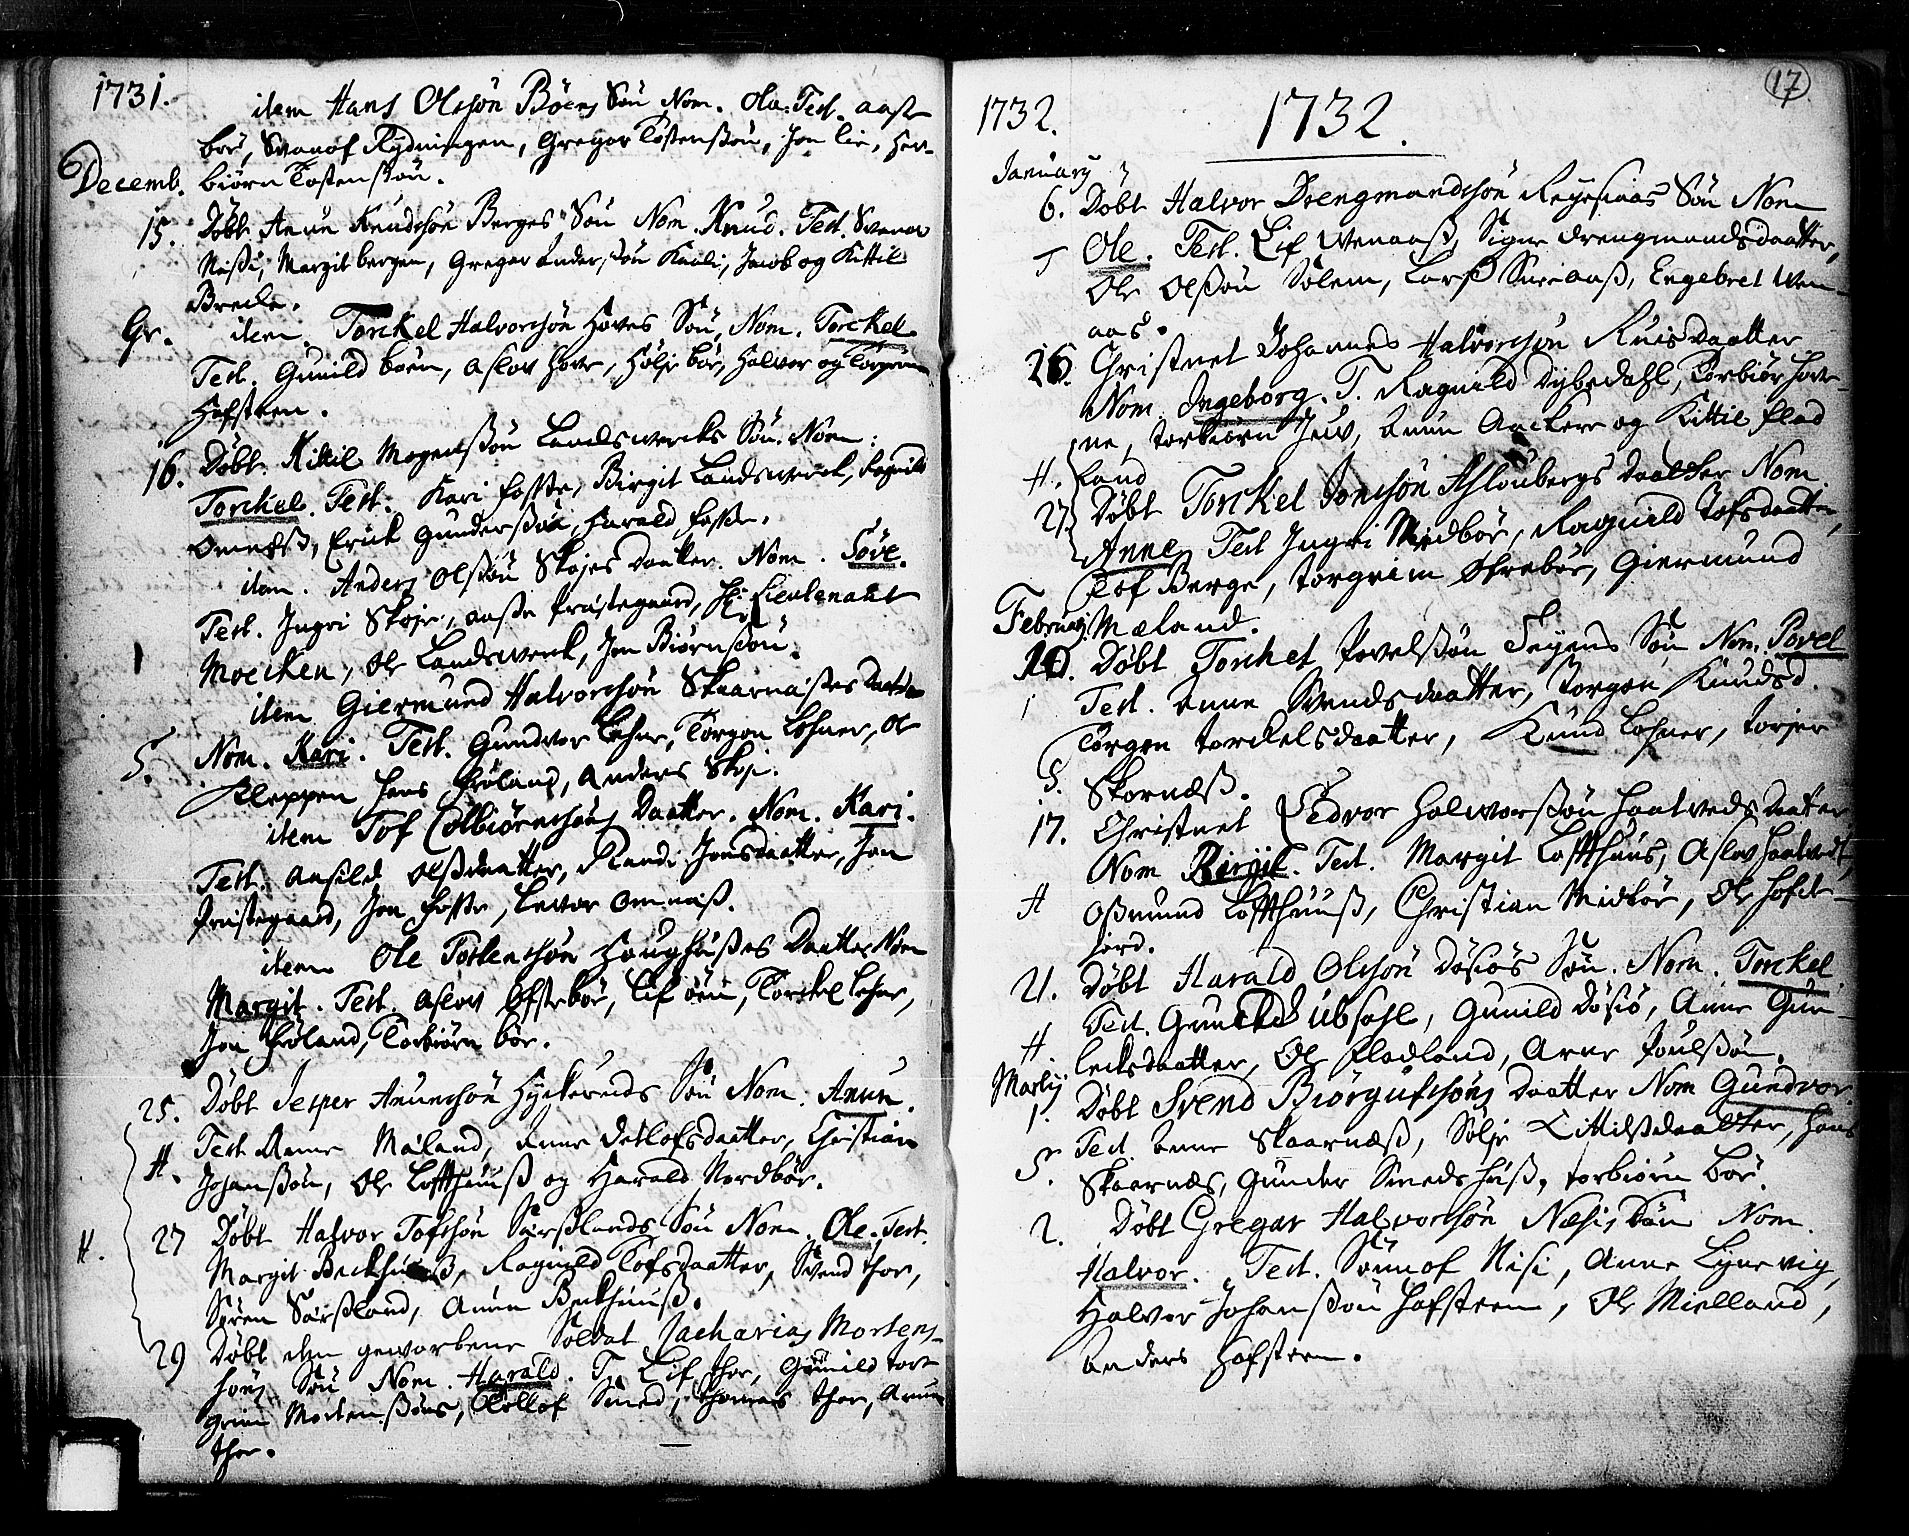 SAKO, Hjartdal kirkebøker, F/Fa/L0003: Ministerialbok nr. I 3, 1727-1775, s. 17